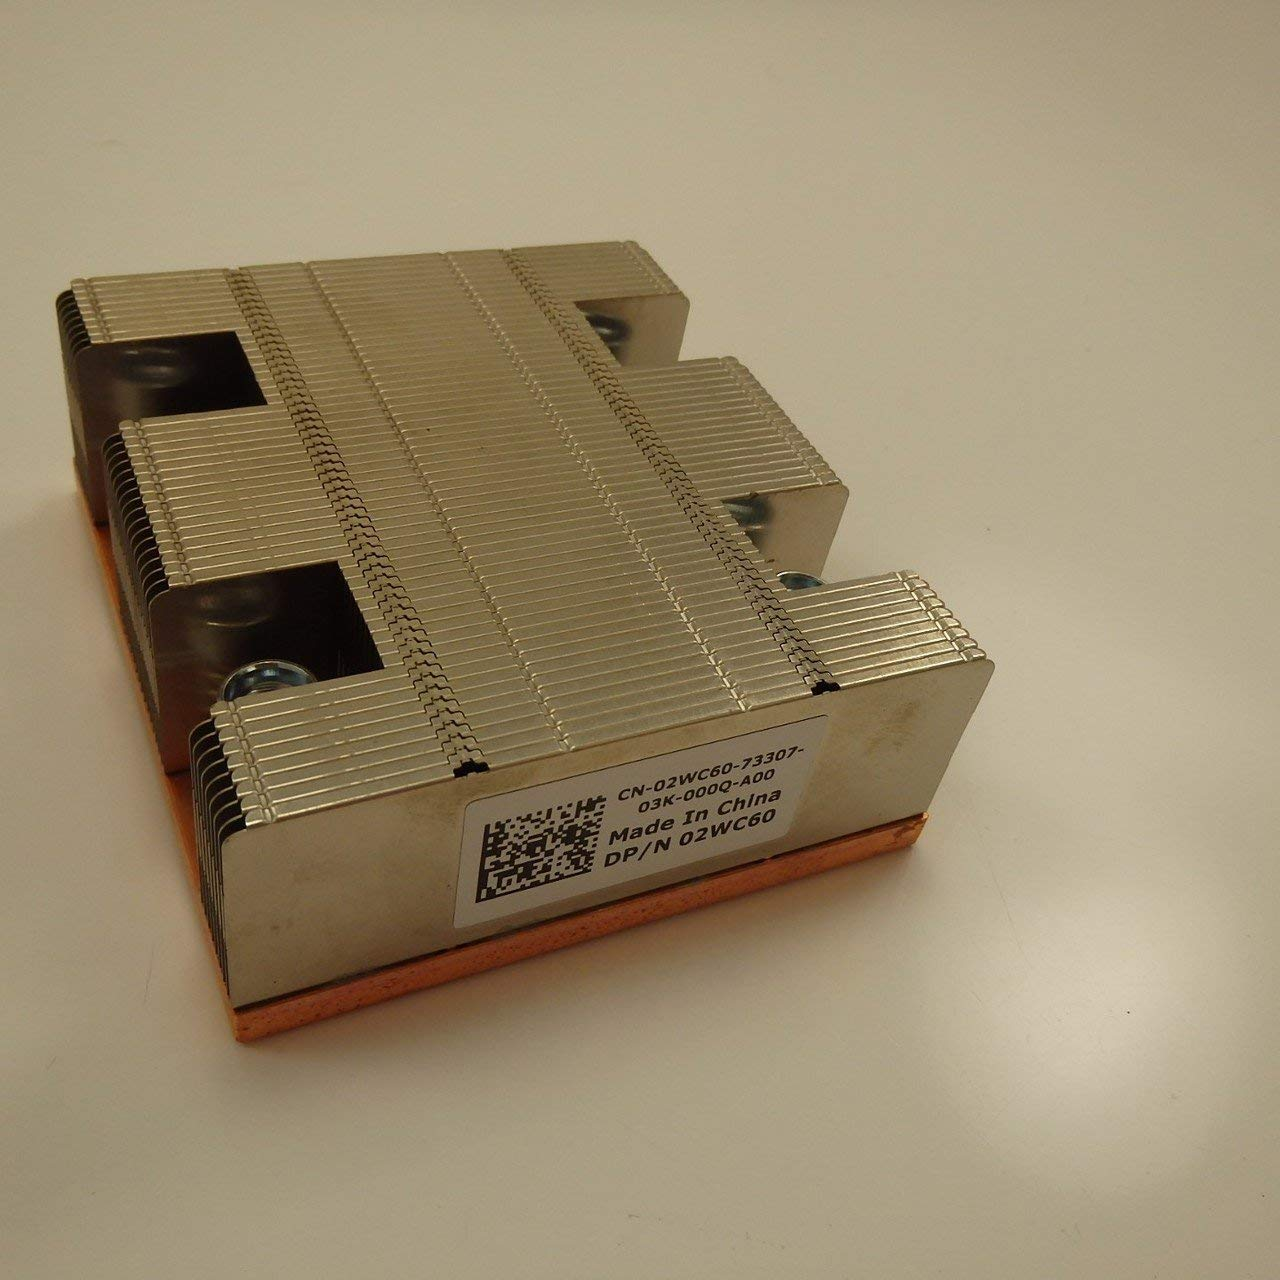 Dell 2WC60 PowerEdge M805 M905 Copper Base Heatsink with Mount Screws Renewed